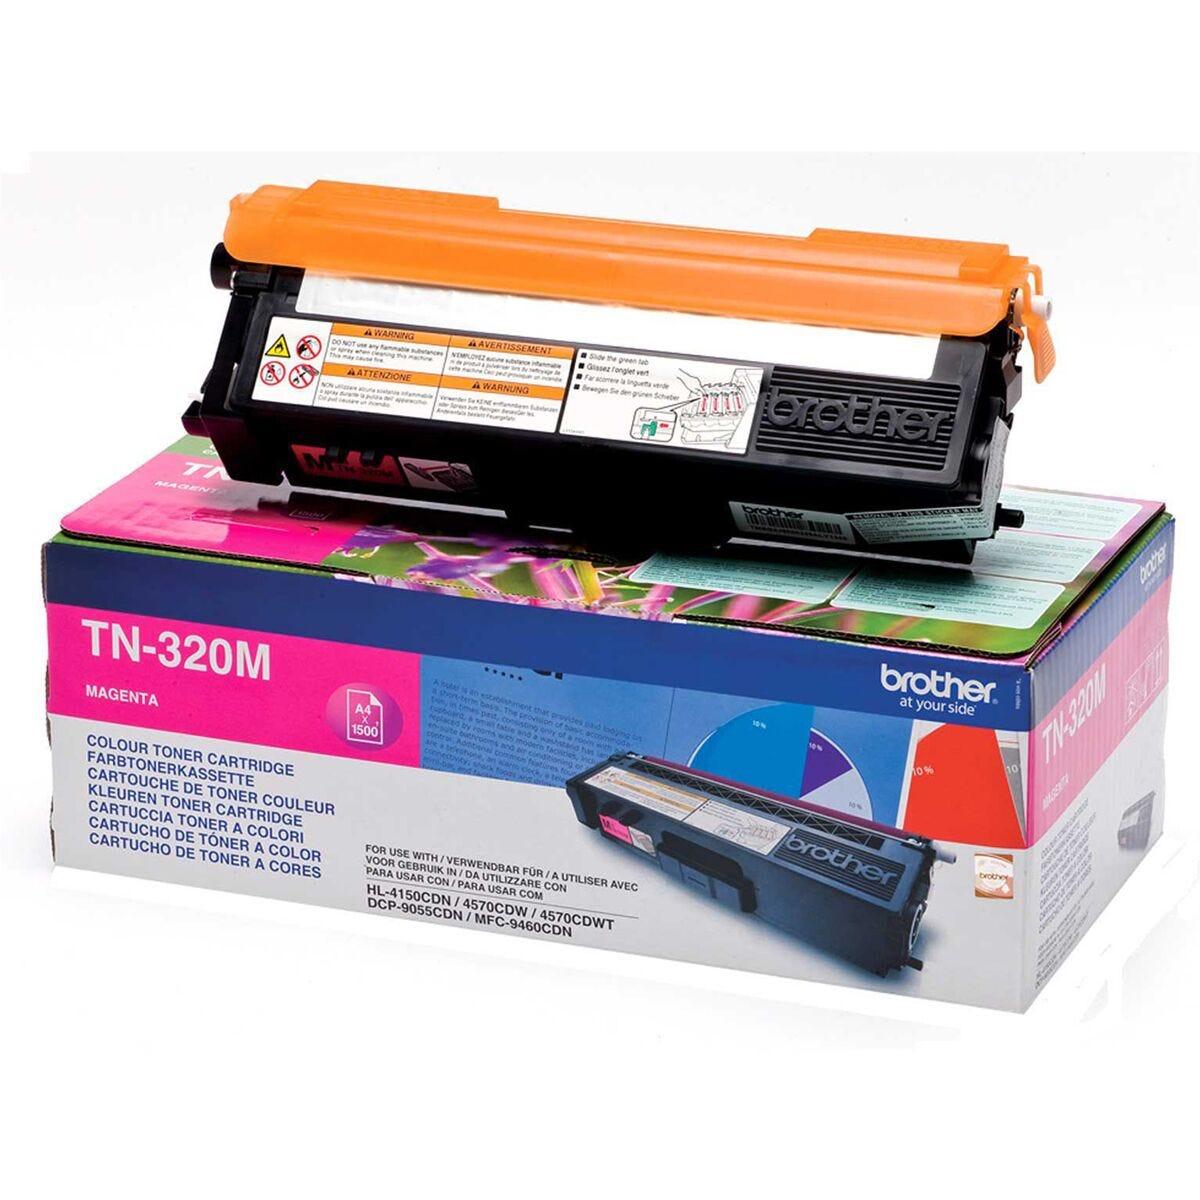 Brother TN 320 Toner Ink Printer Cartridge Magenta